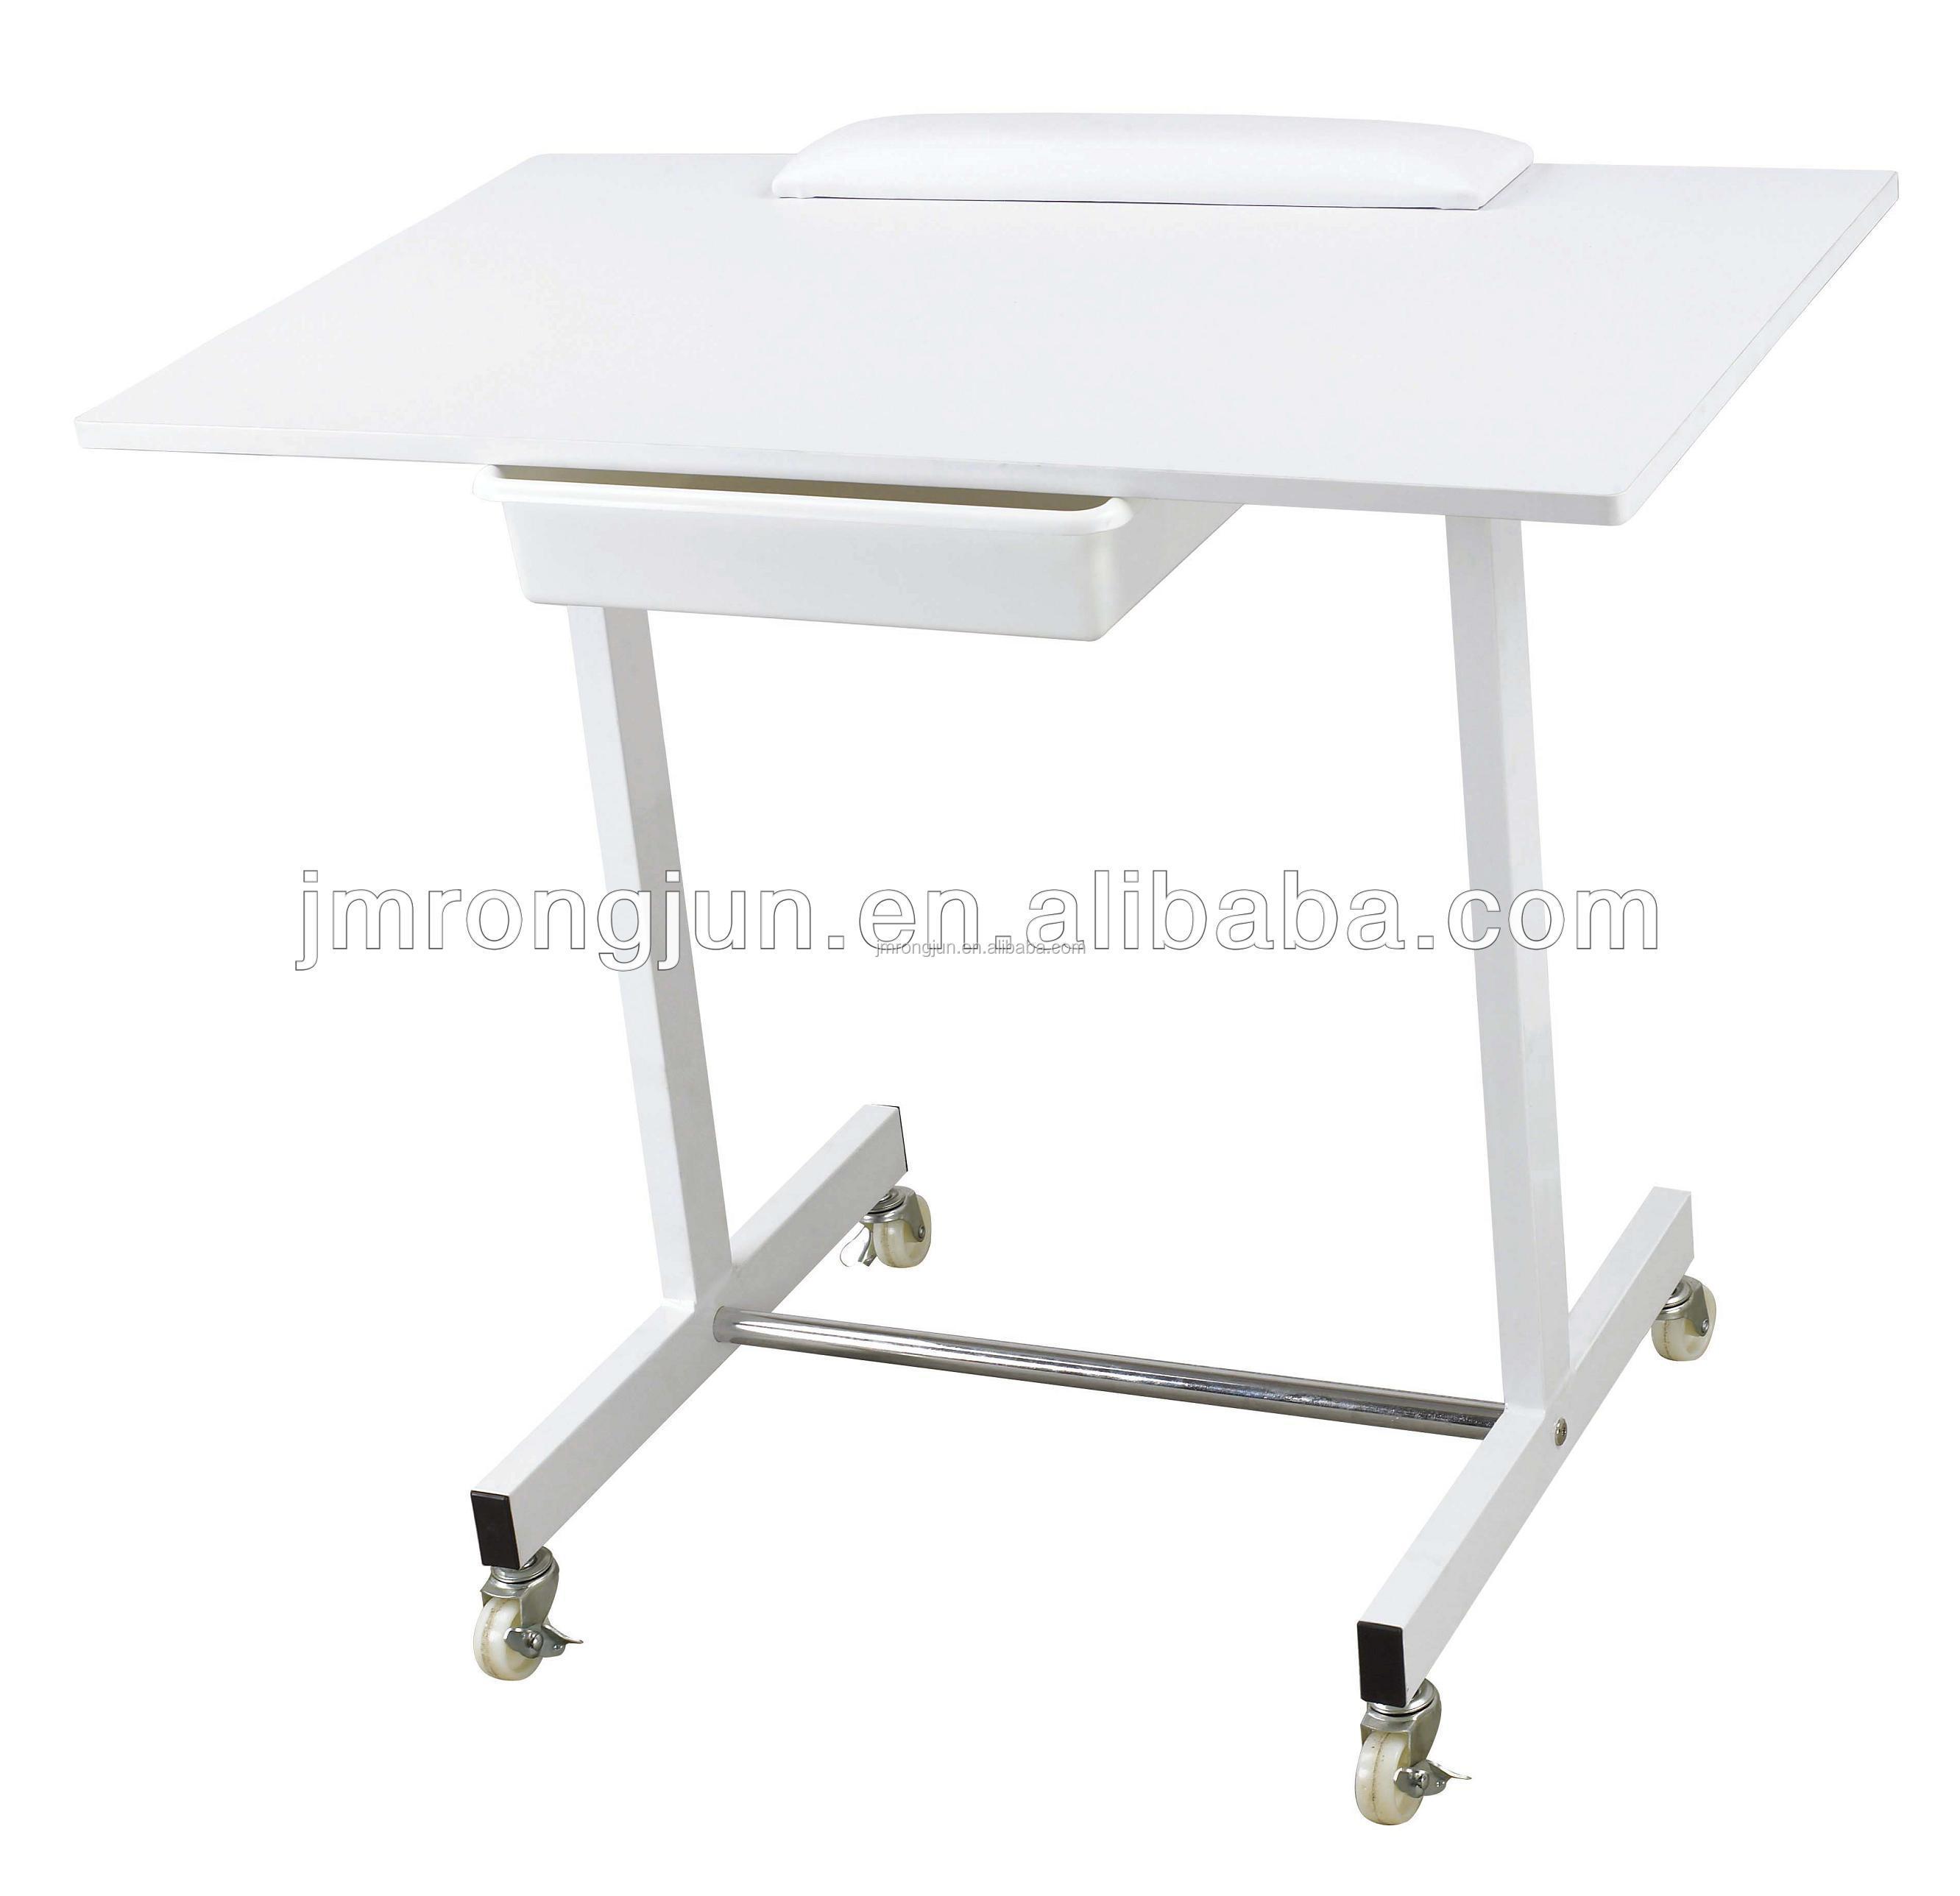 dublinrhbellafurnitureie with manicure vacuum estetica salon for ebayrhebaycom chair nail cleaner numsekongen table stylish marylin vezzosi sale chairs salons